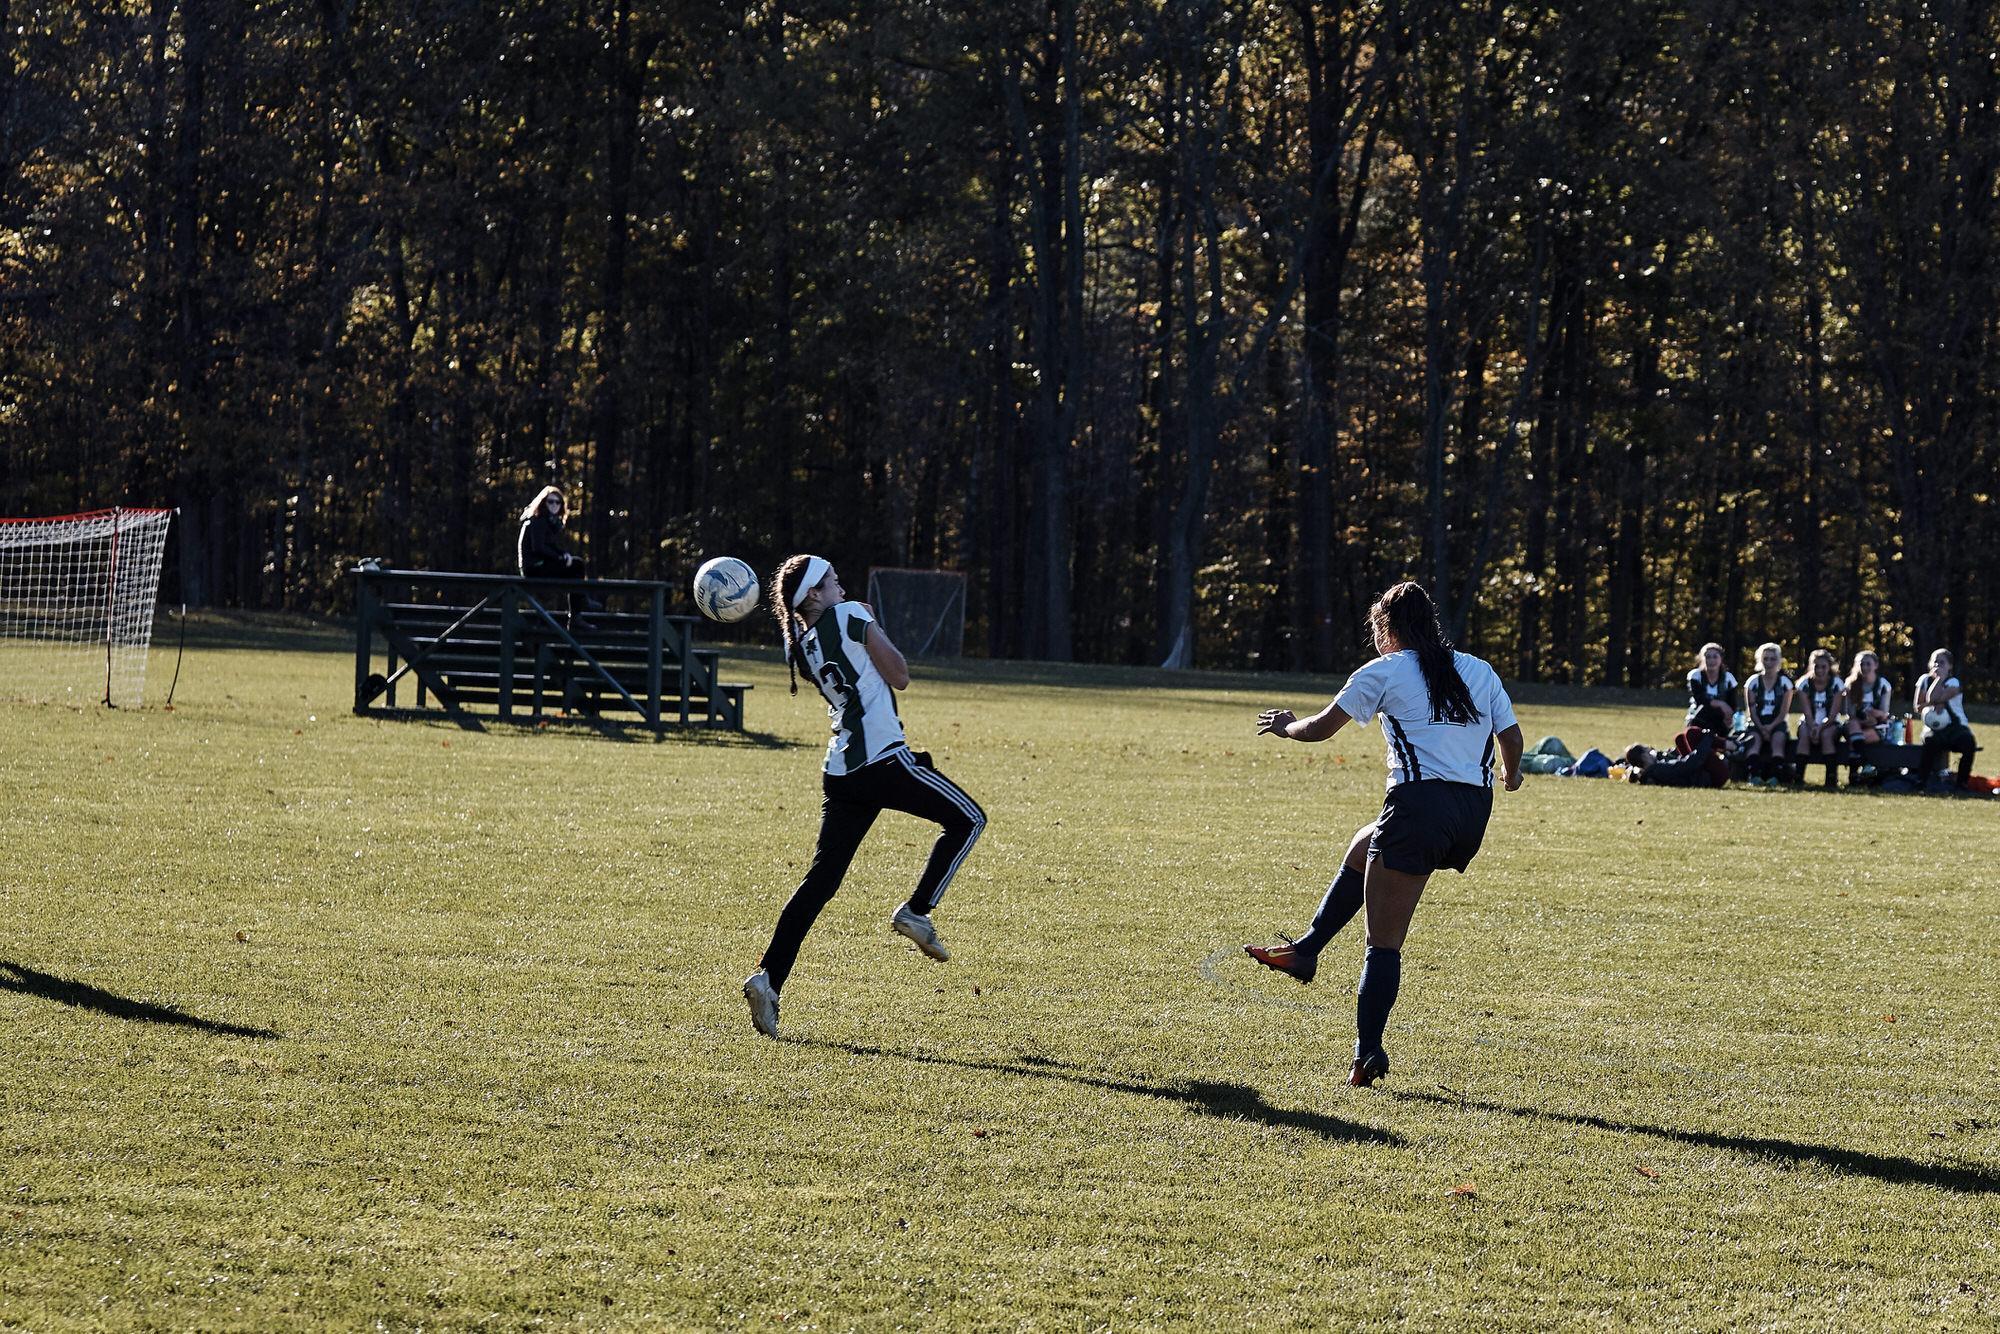 Girls Varsity Soccer vs. Putney School - October 26, 2018 - 024.jpg